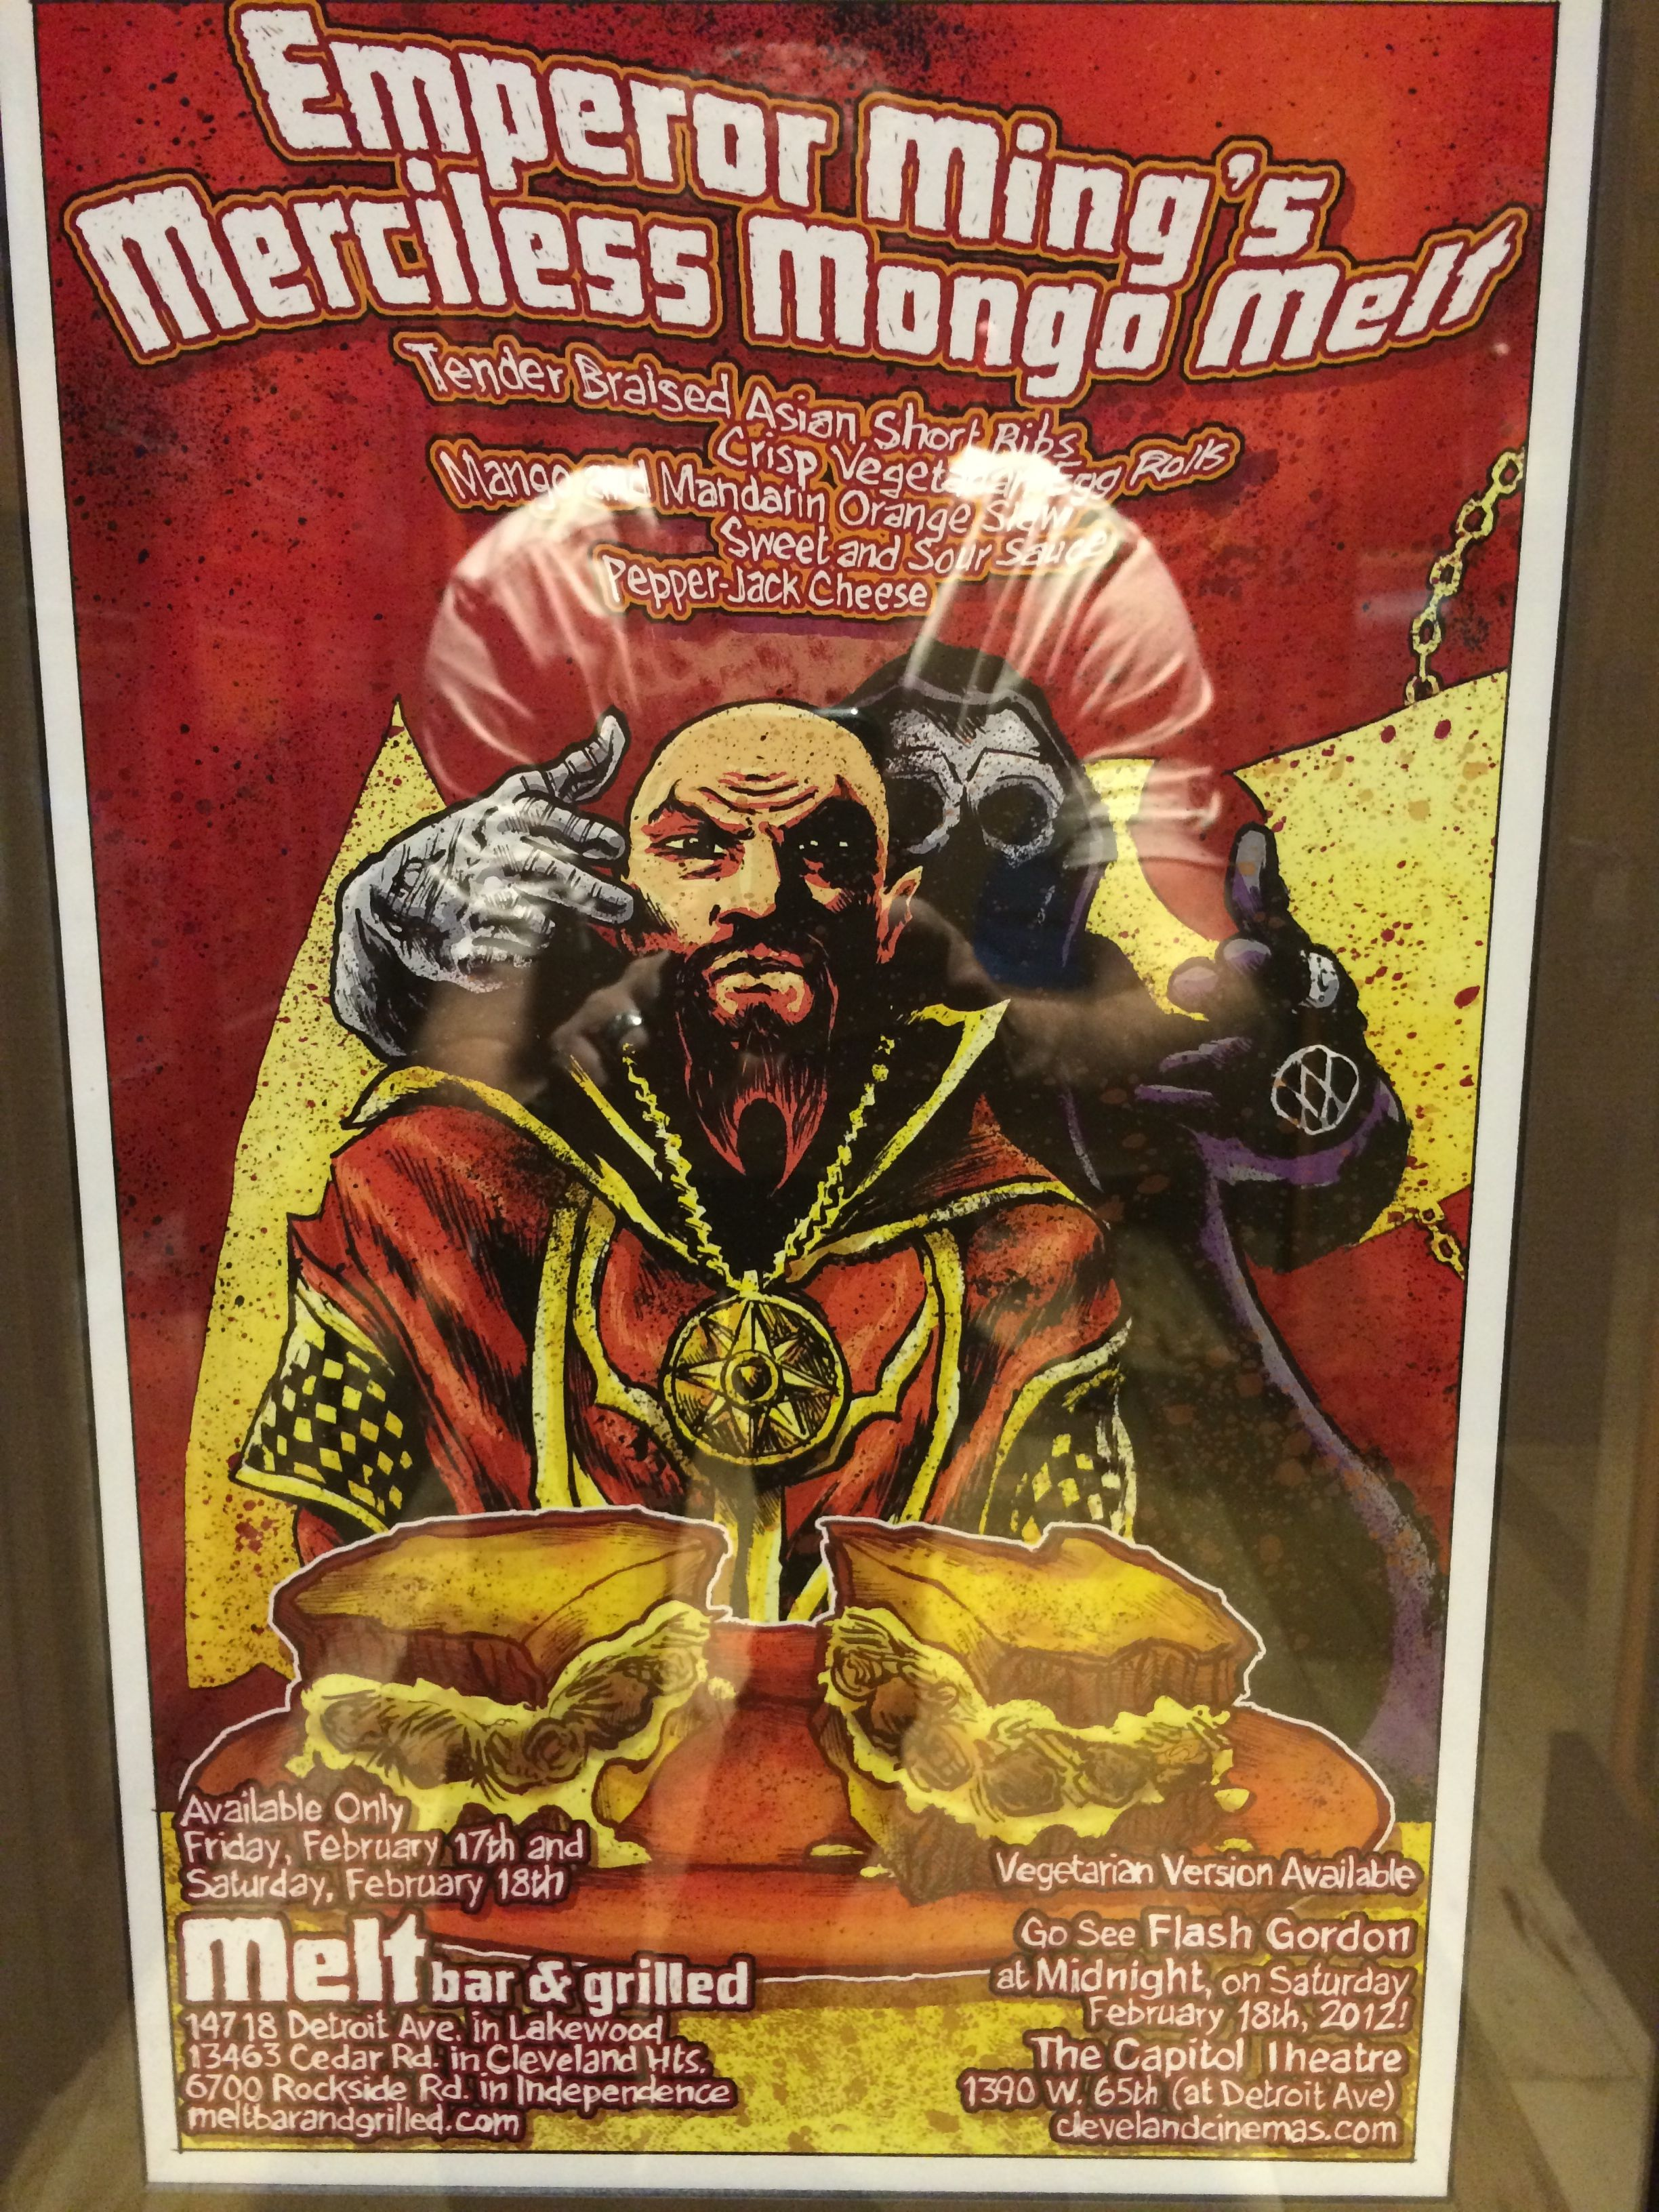 Emperor Ming's Merciless Mongo Melt